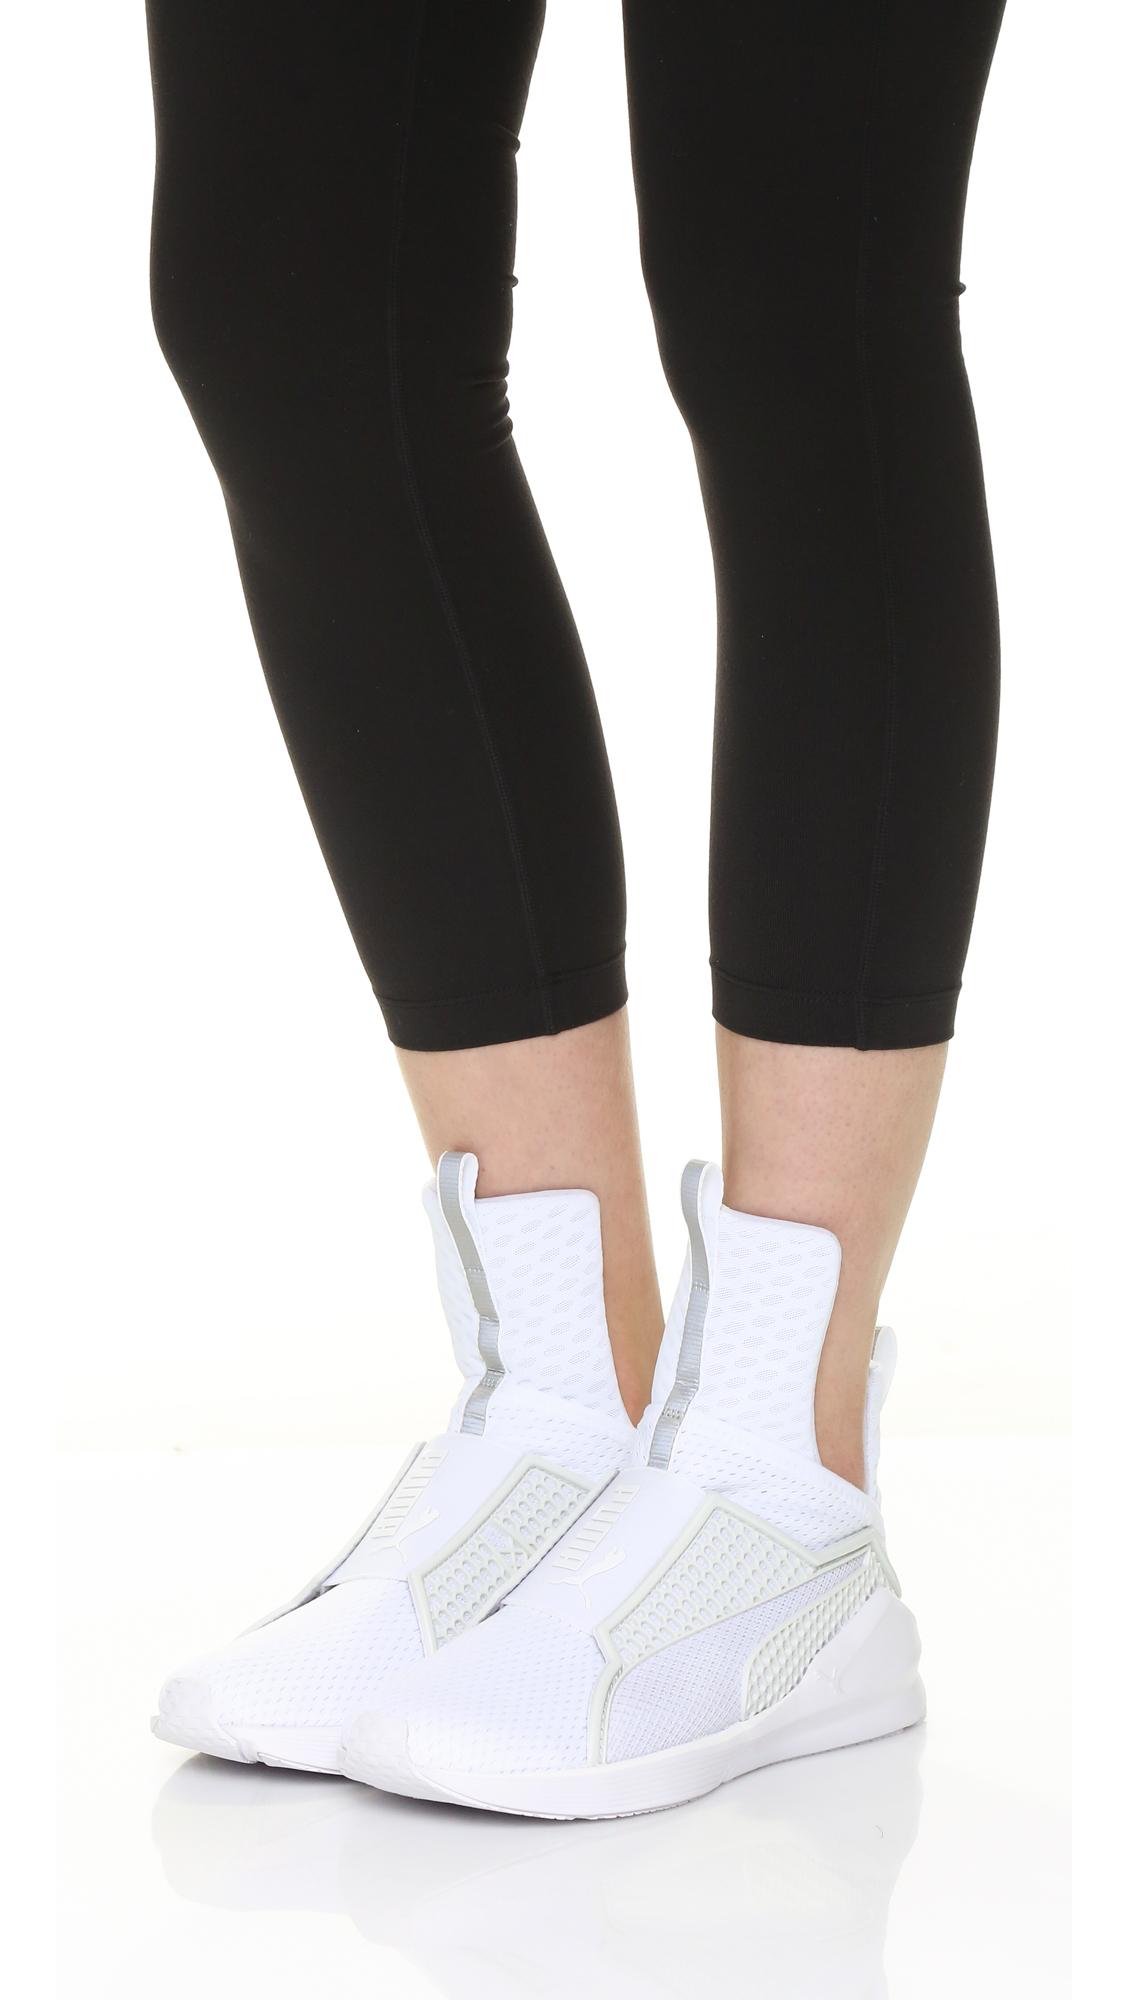 sports shoes 4034e ce710 PUMA X Rihanna Fenty Trainers in White/White (White) - Lyst